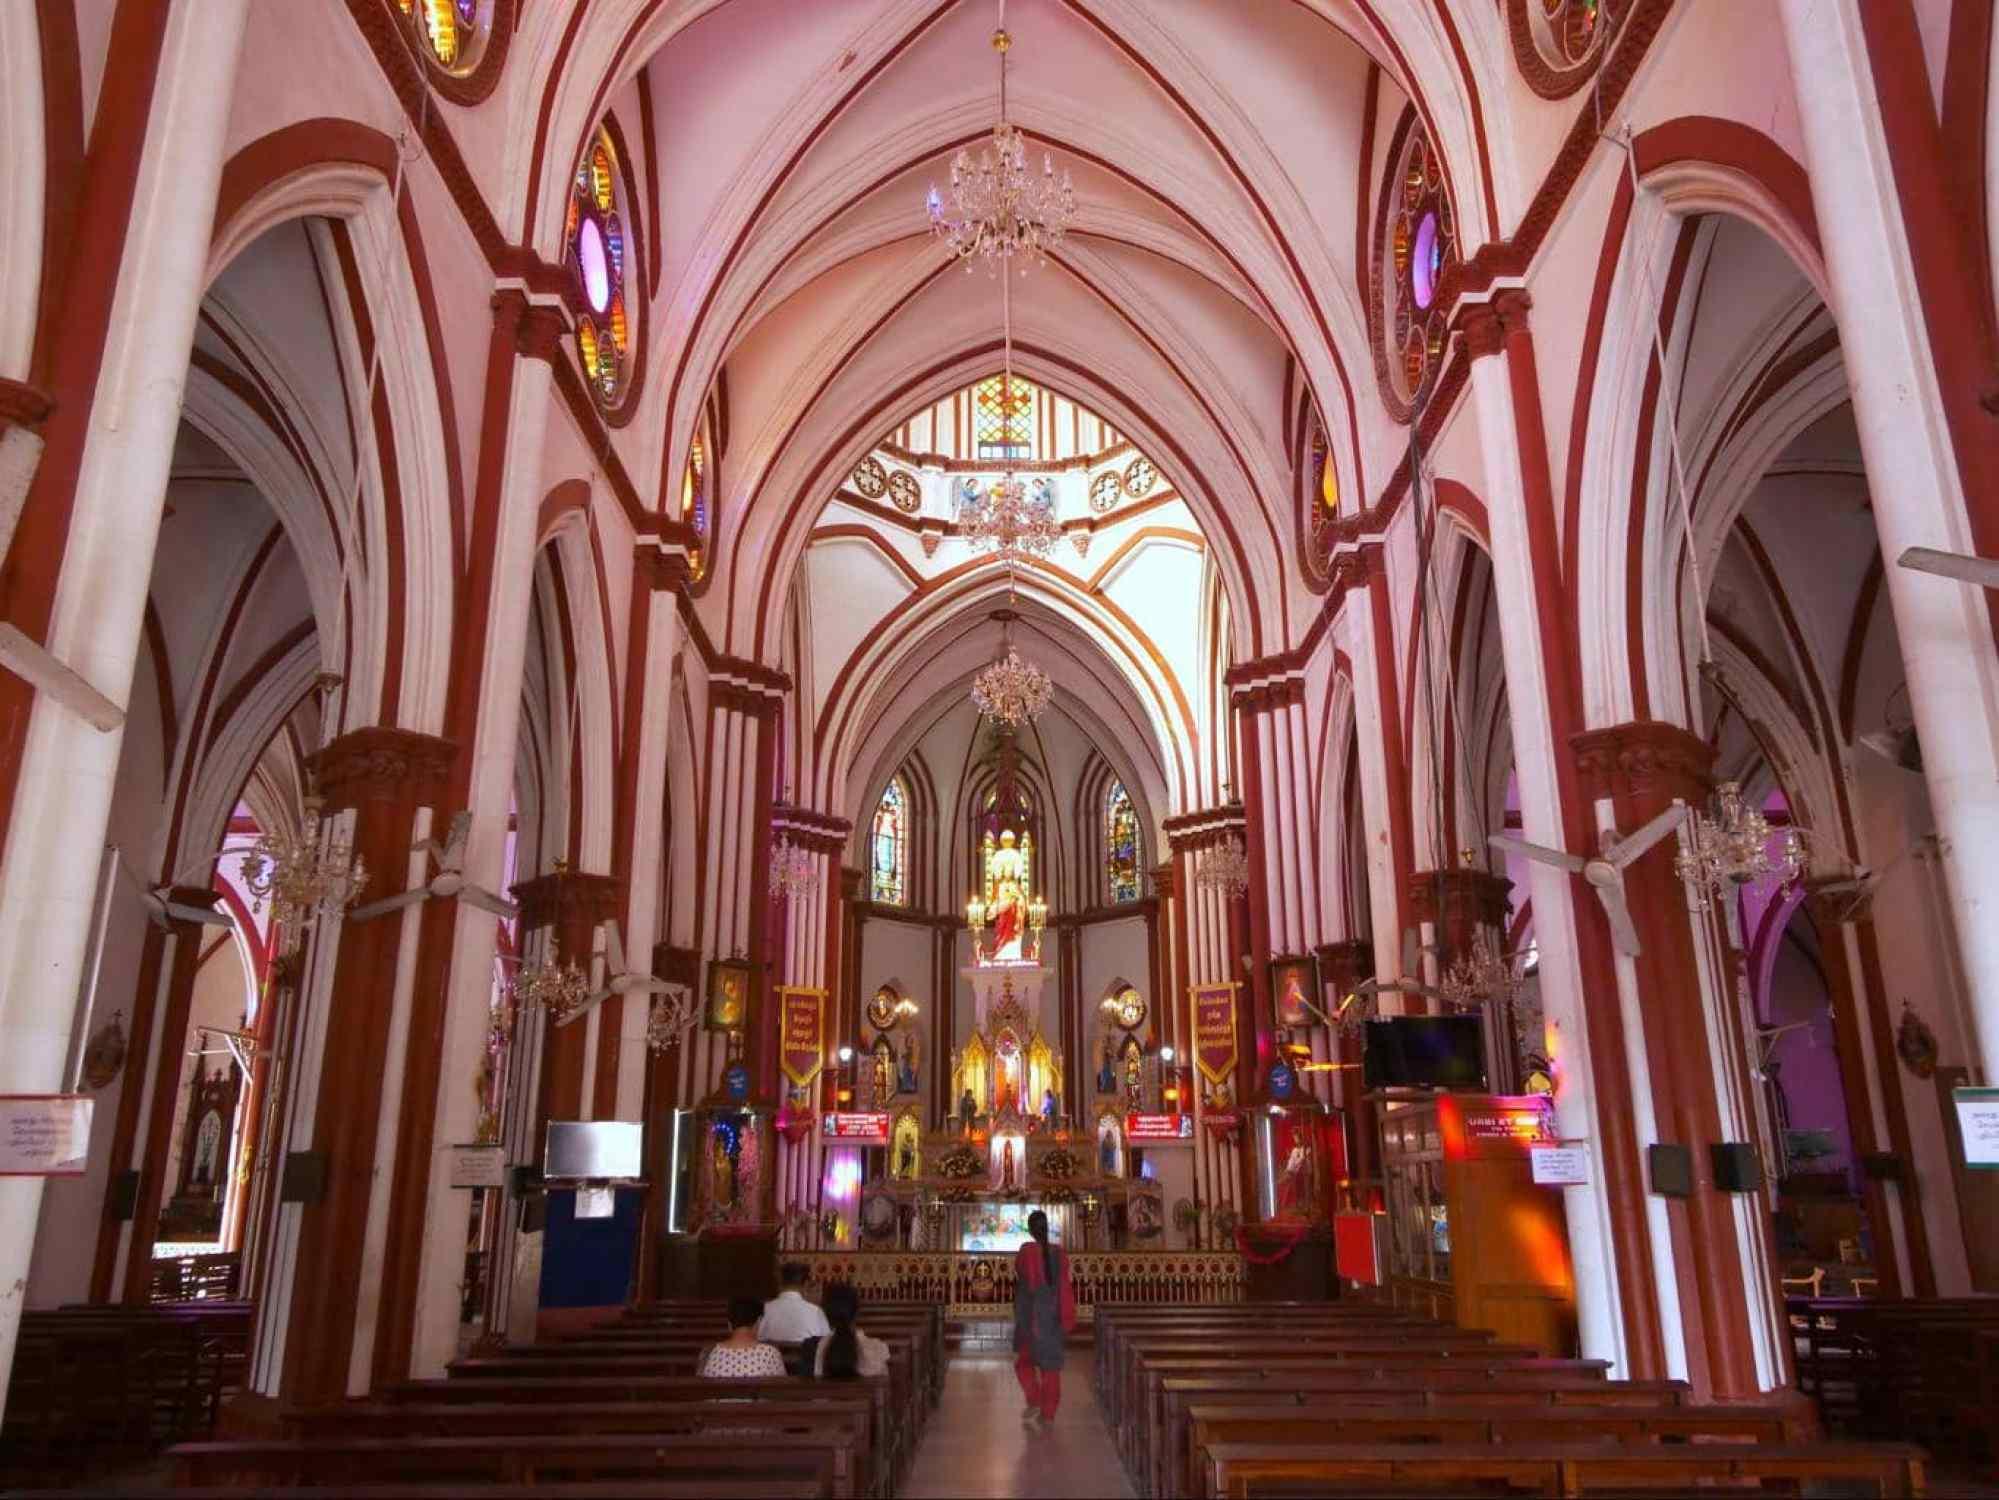 Sacred Heart Basilica interior